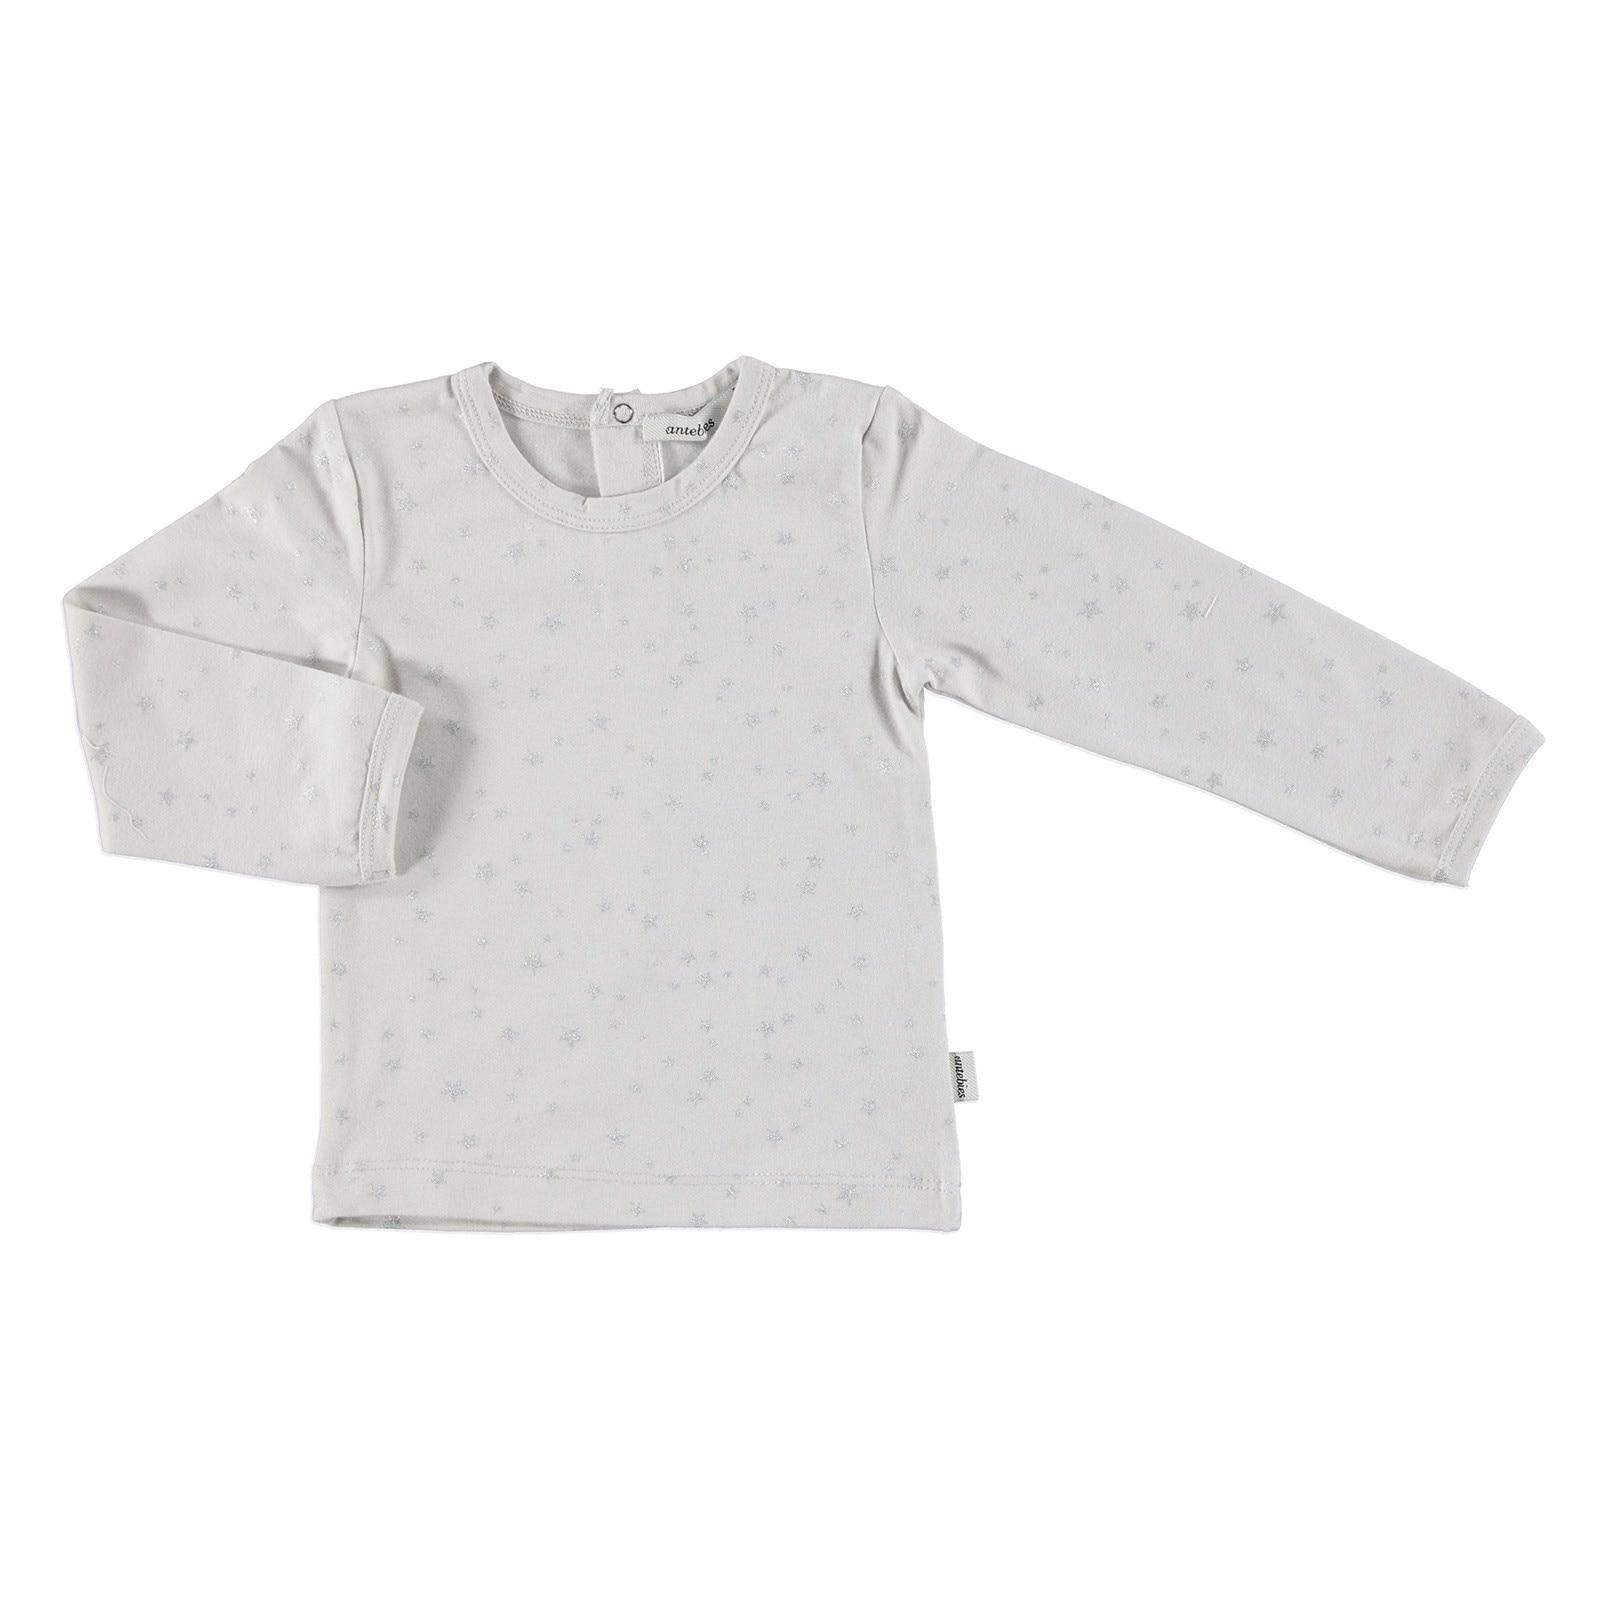 Ebebek Antebies Baby Organic Star Patterned Jersey Fabric Long Sleeve Bodysuit